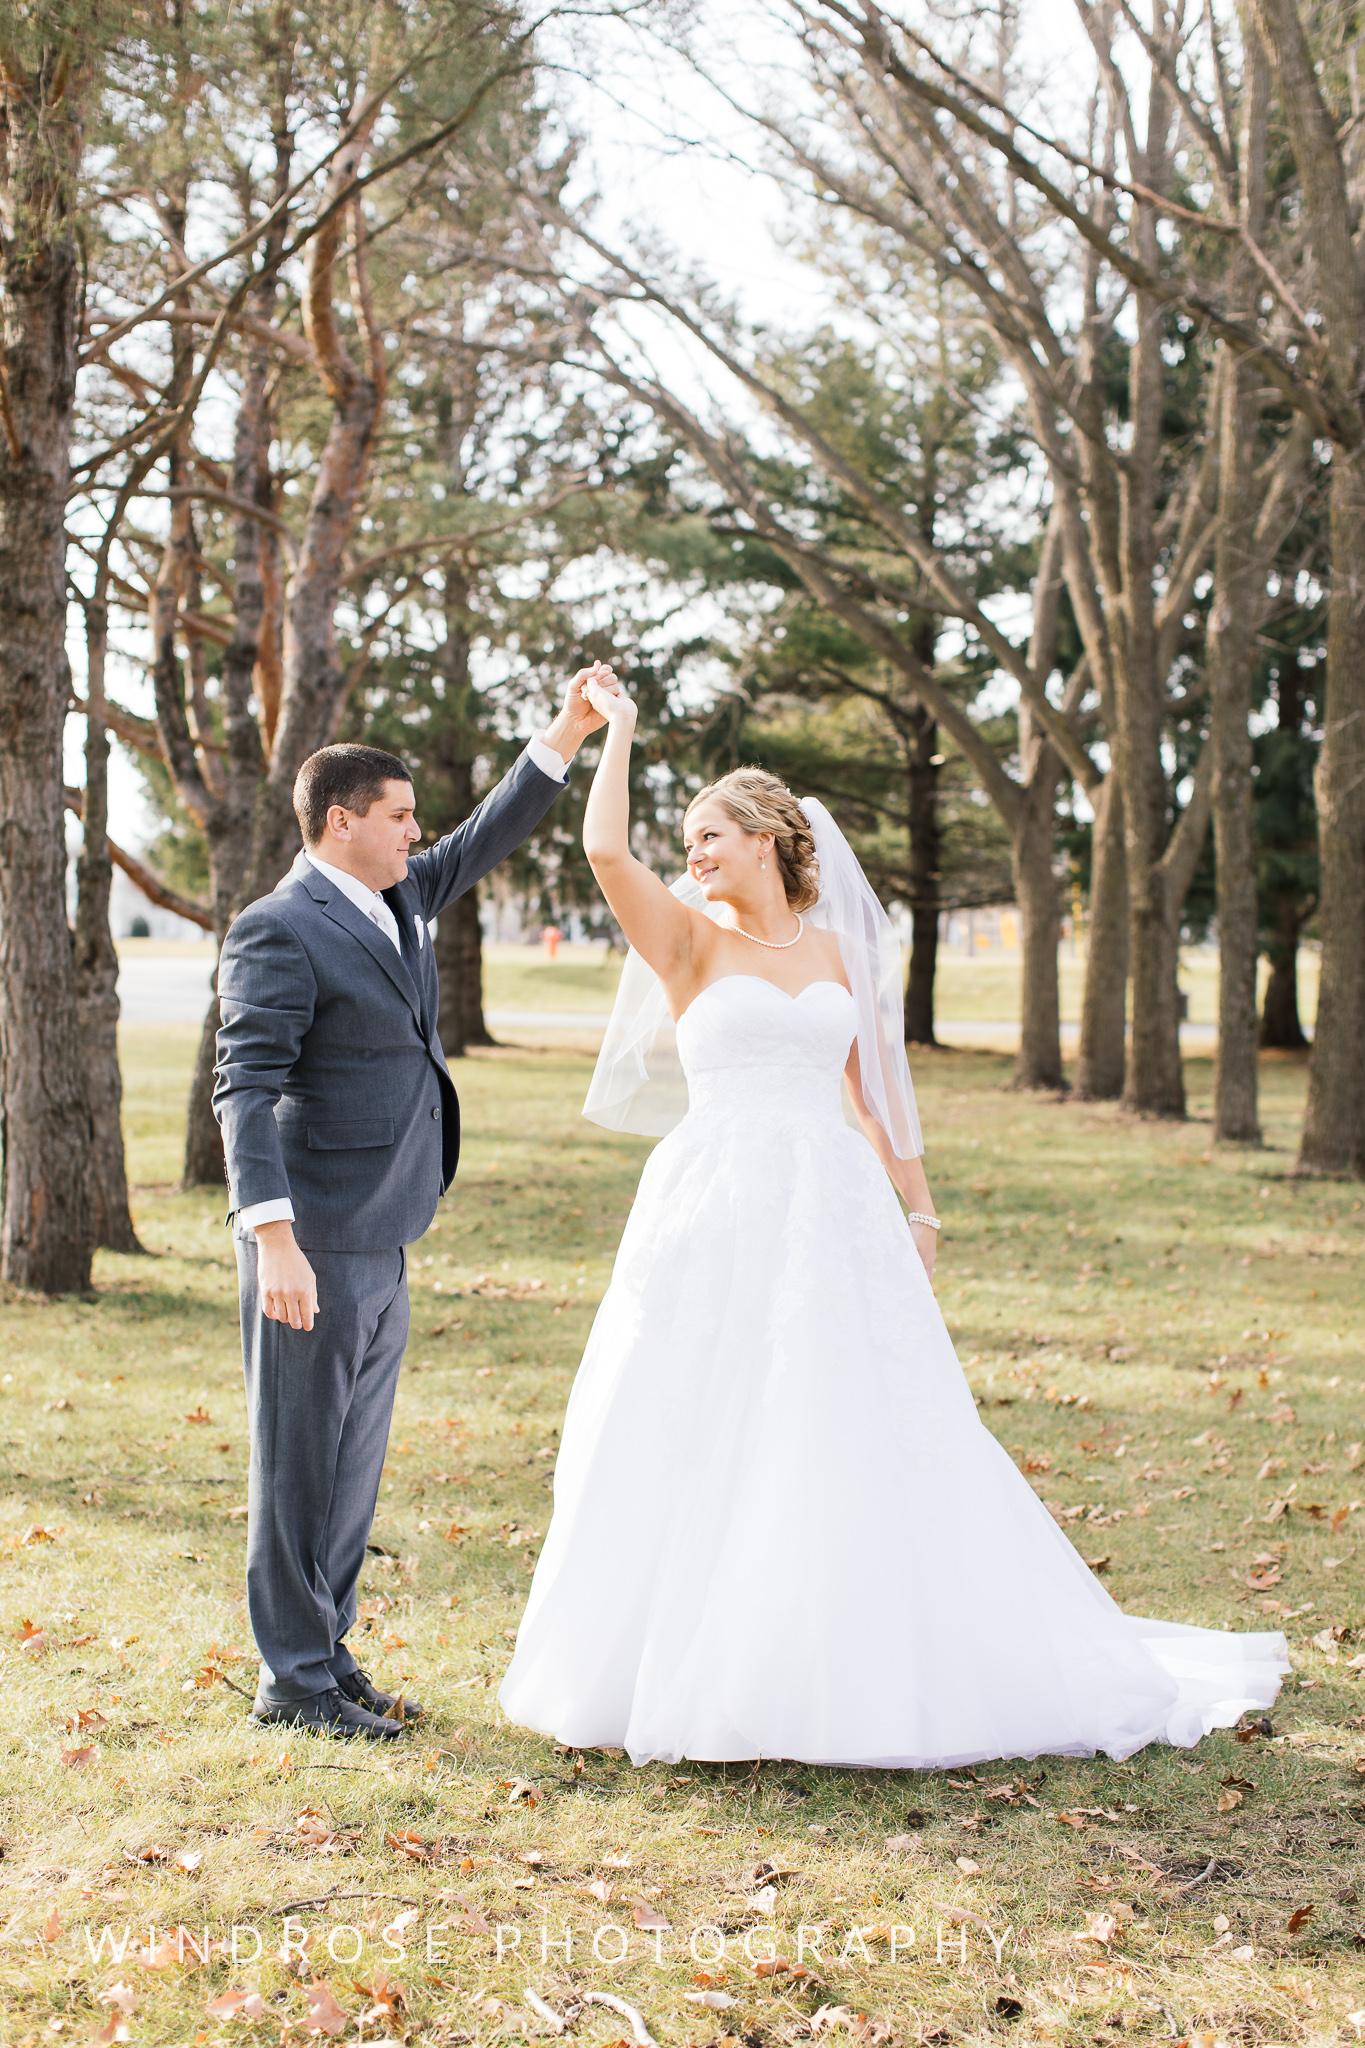 Rochester-MN-Wedding-Photo-11.jpg